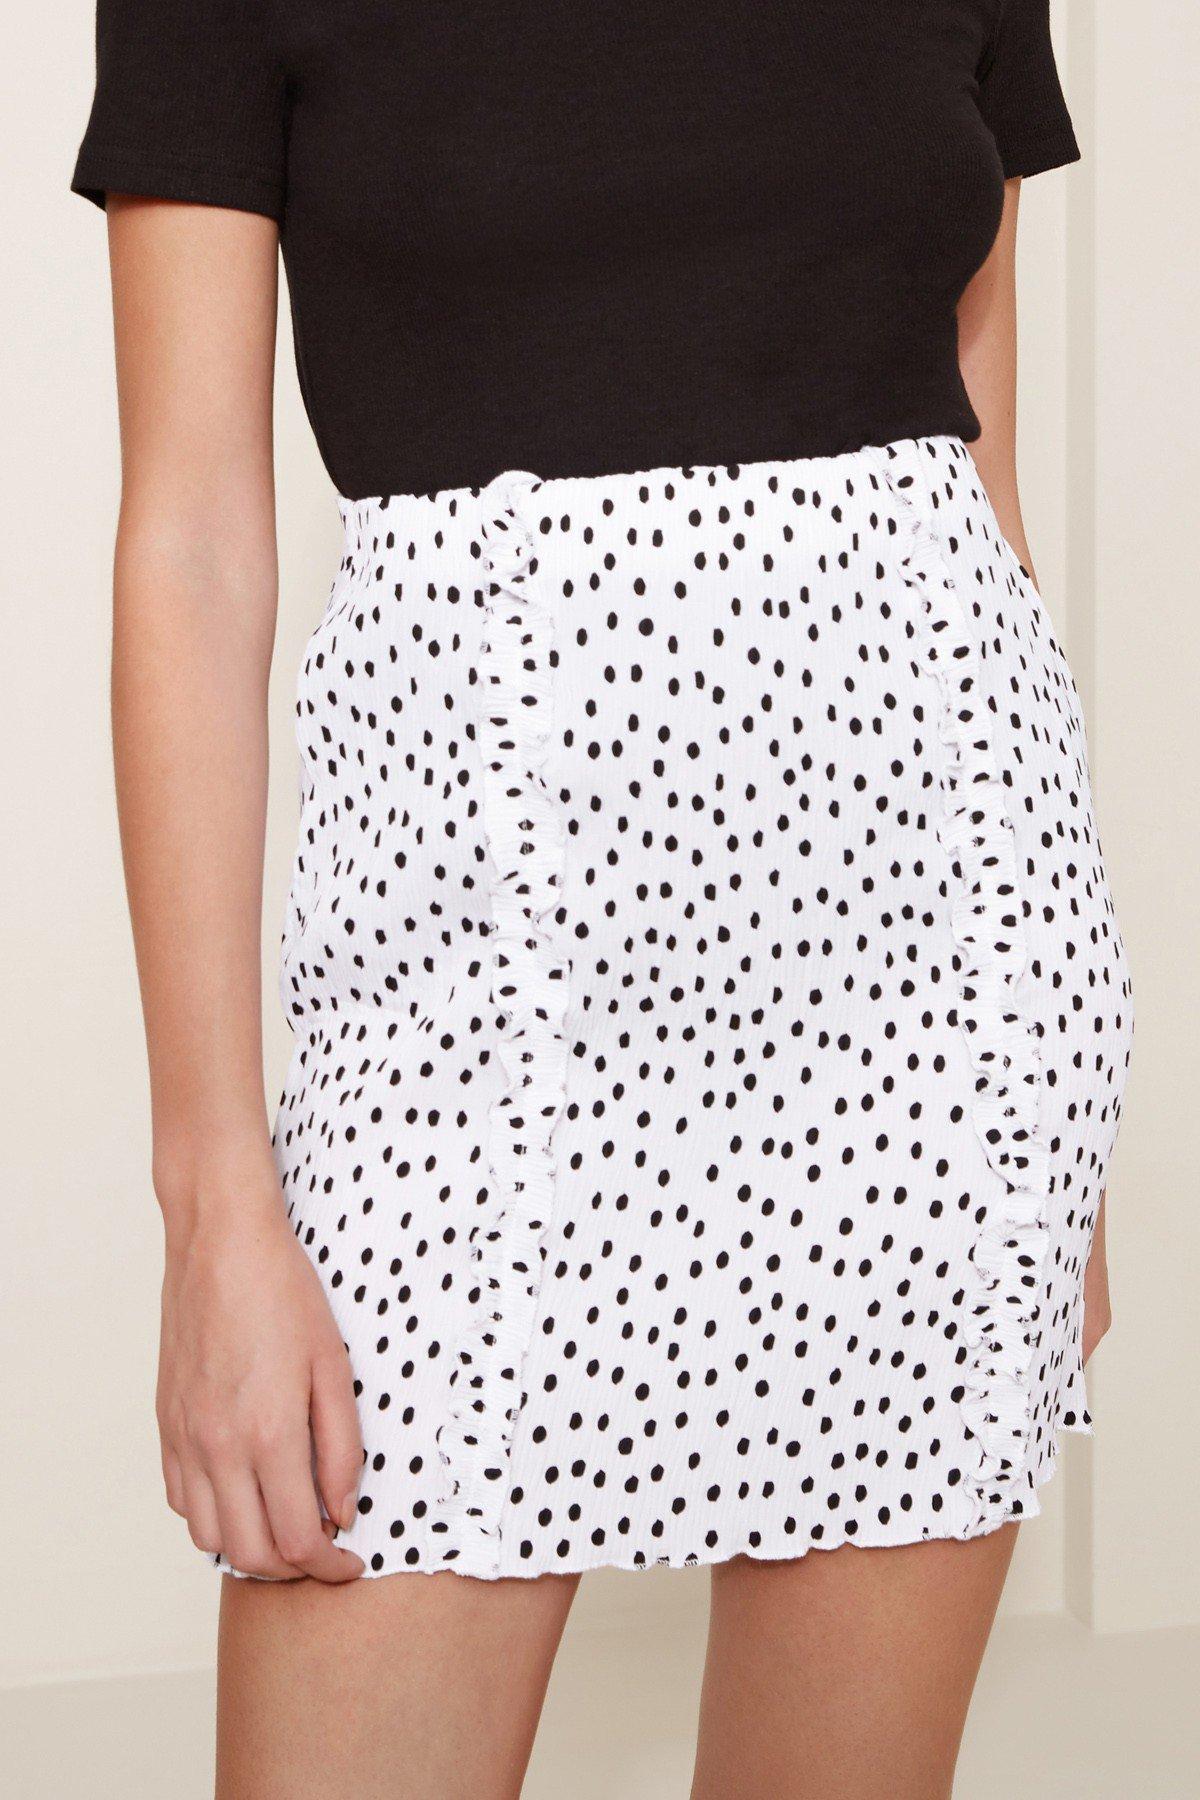 Shop The Fifth Atlanta Polka Dot Skirt.